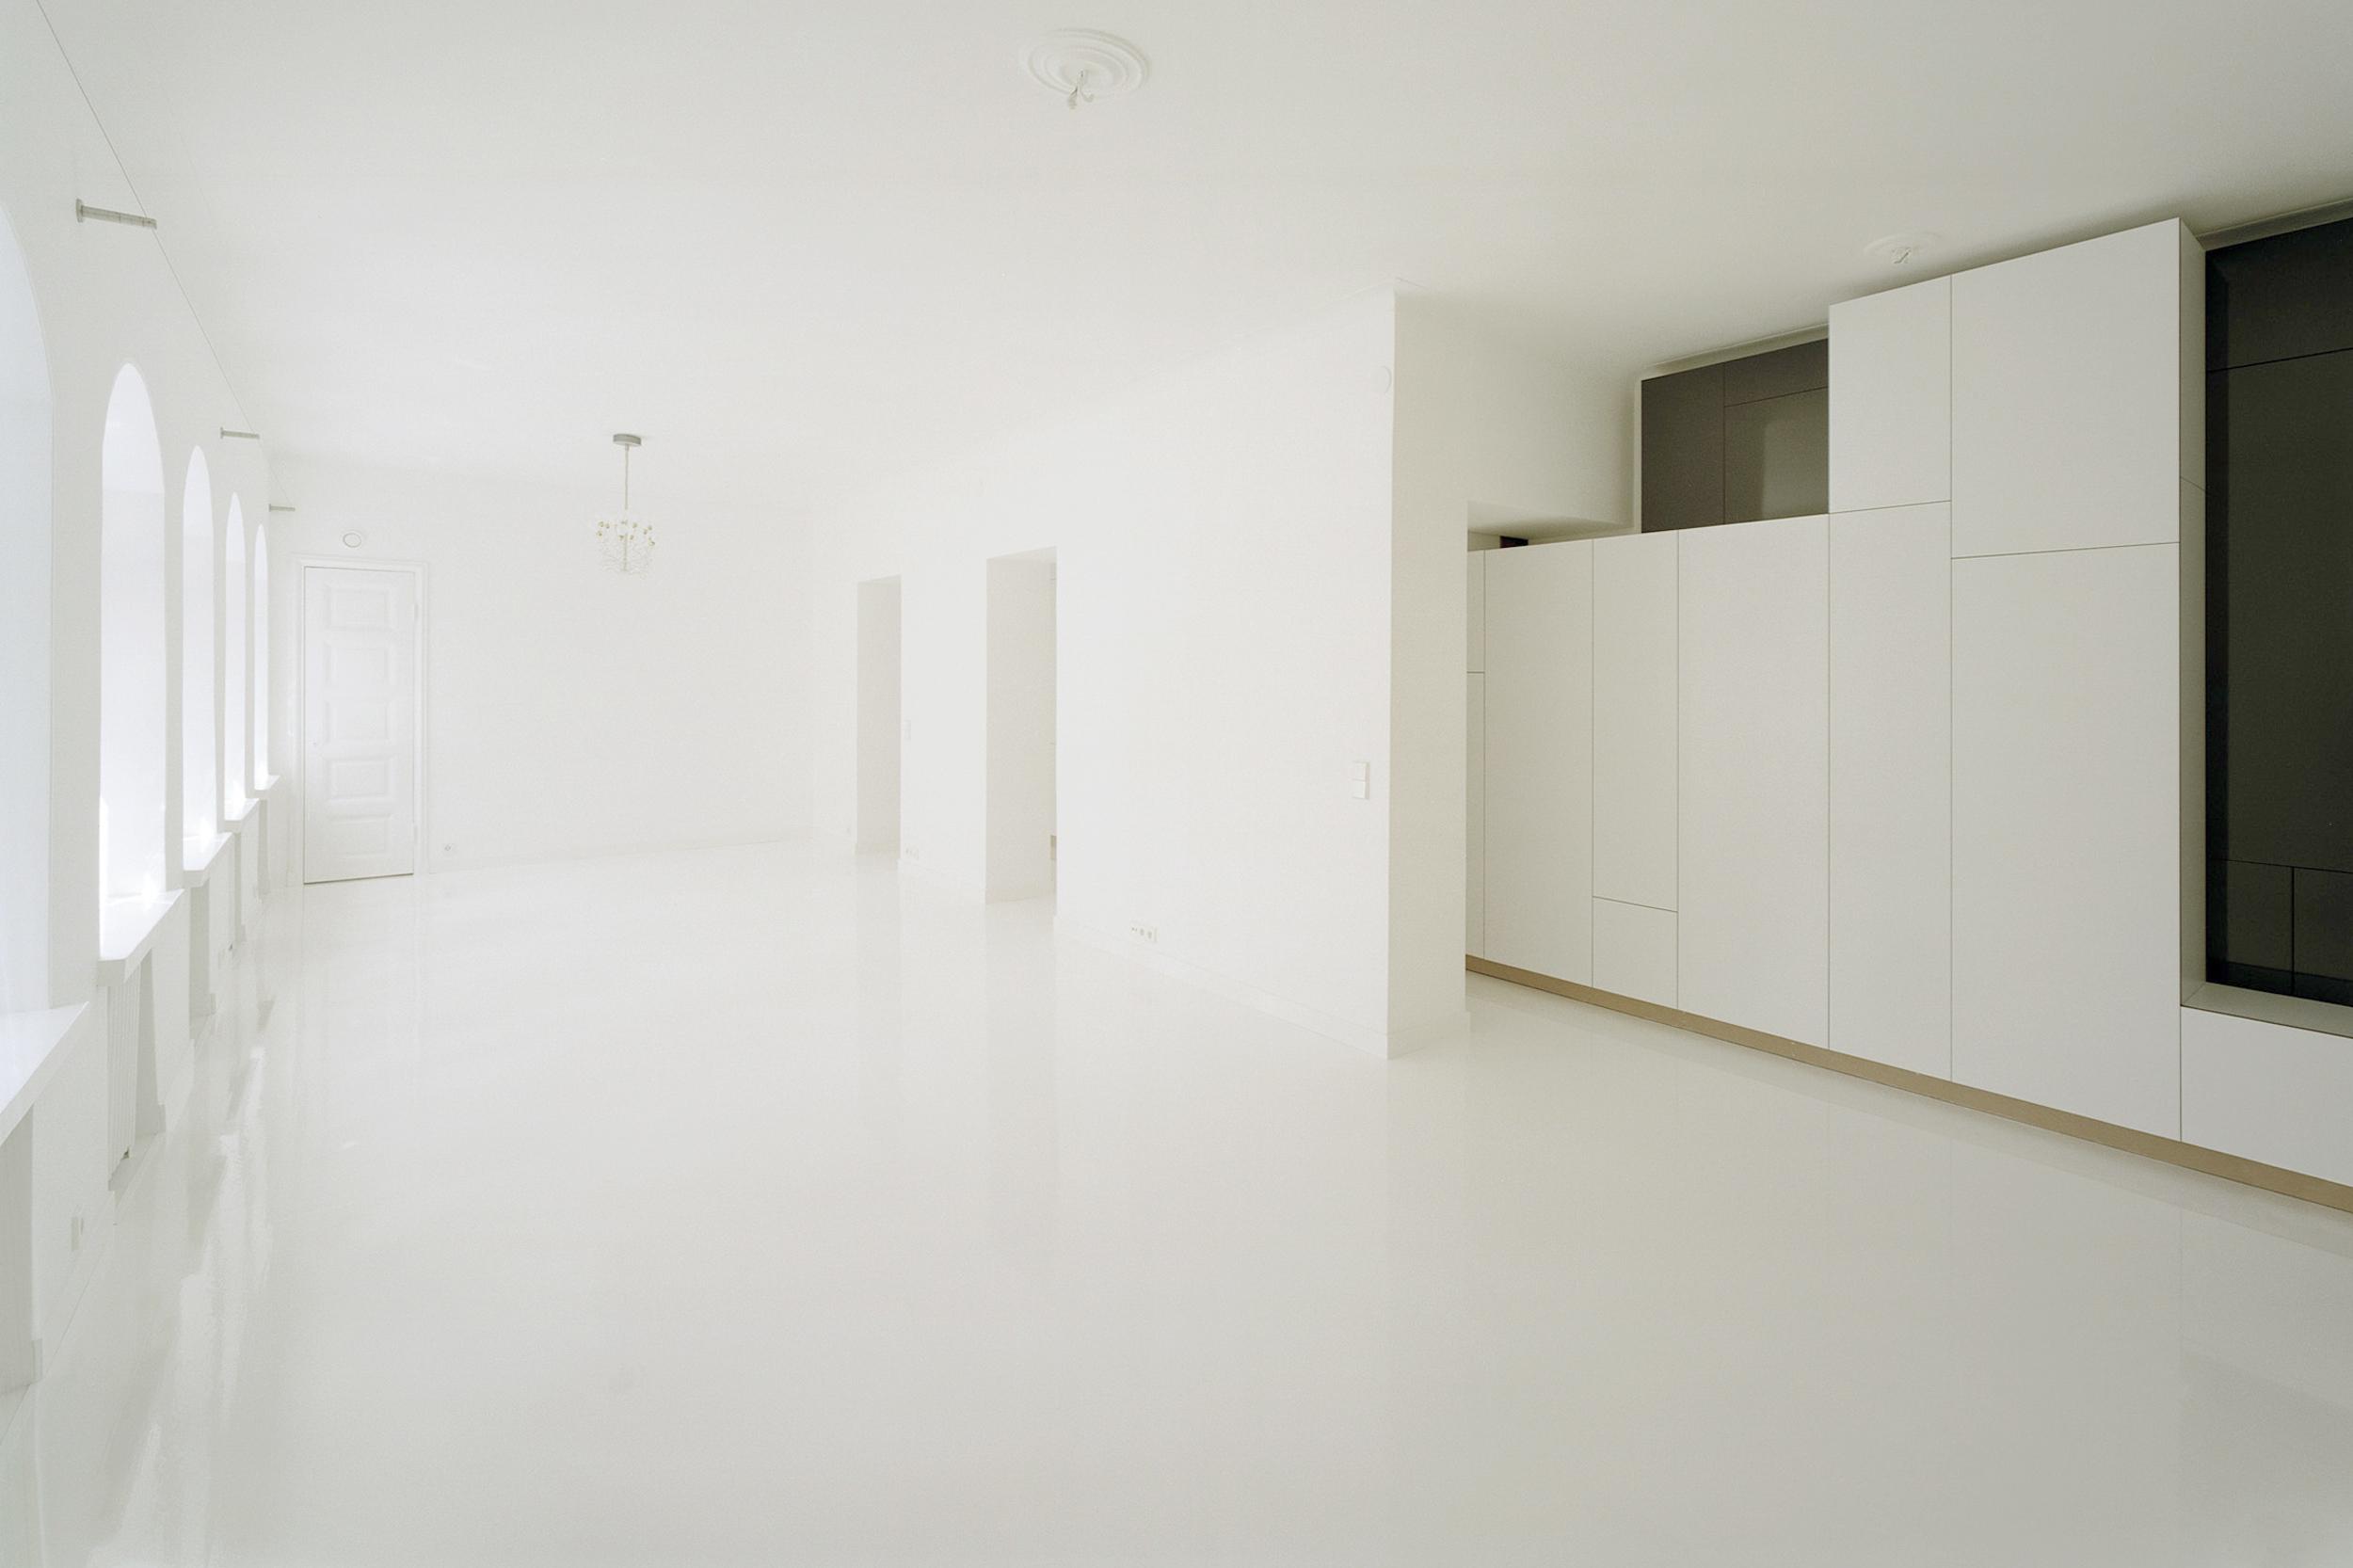 White Solaris cabinets by Habitek